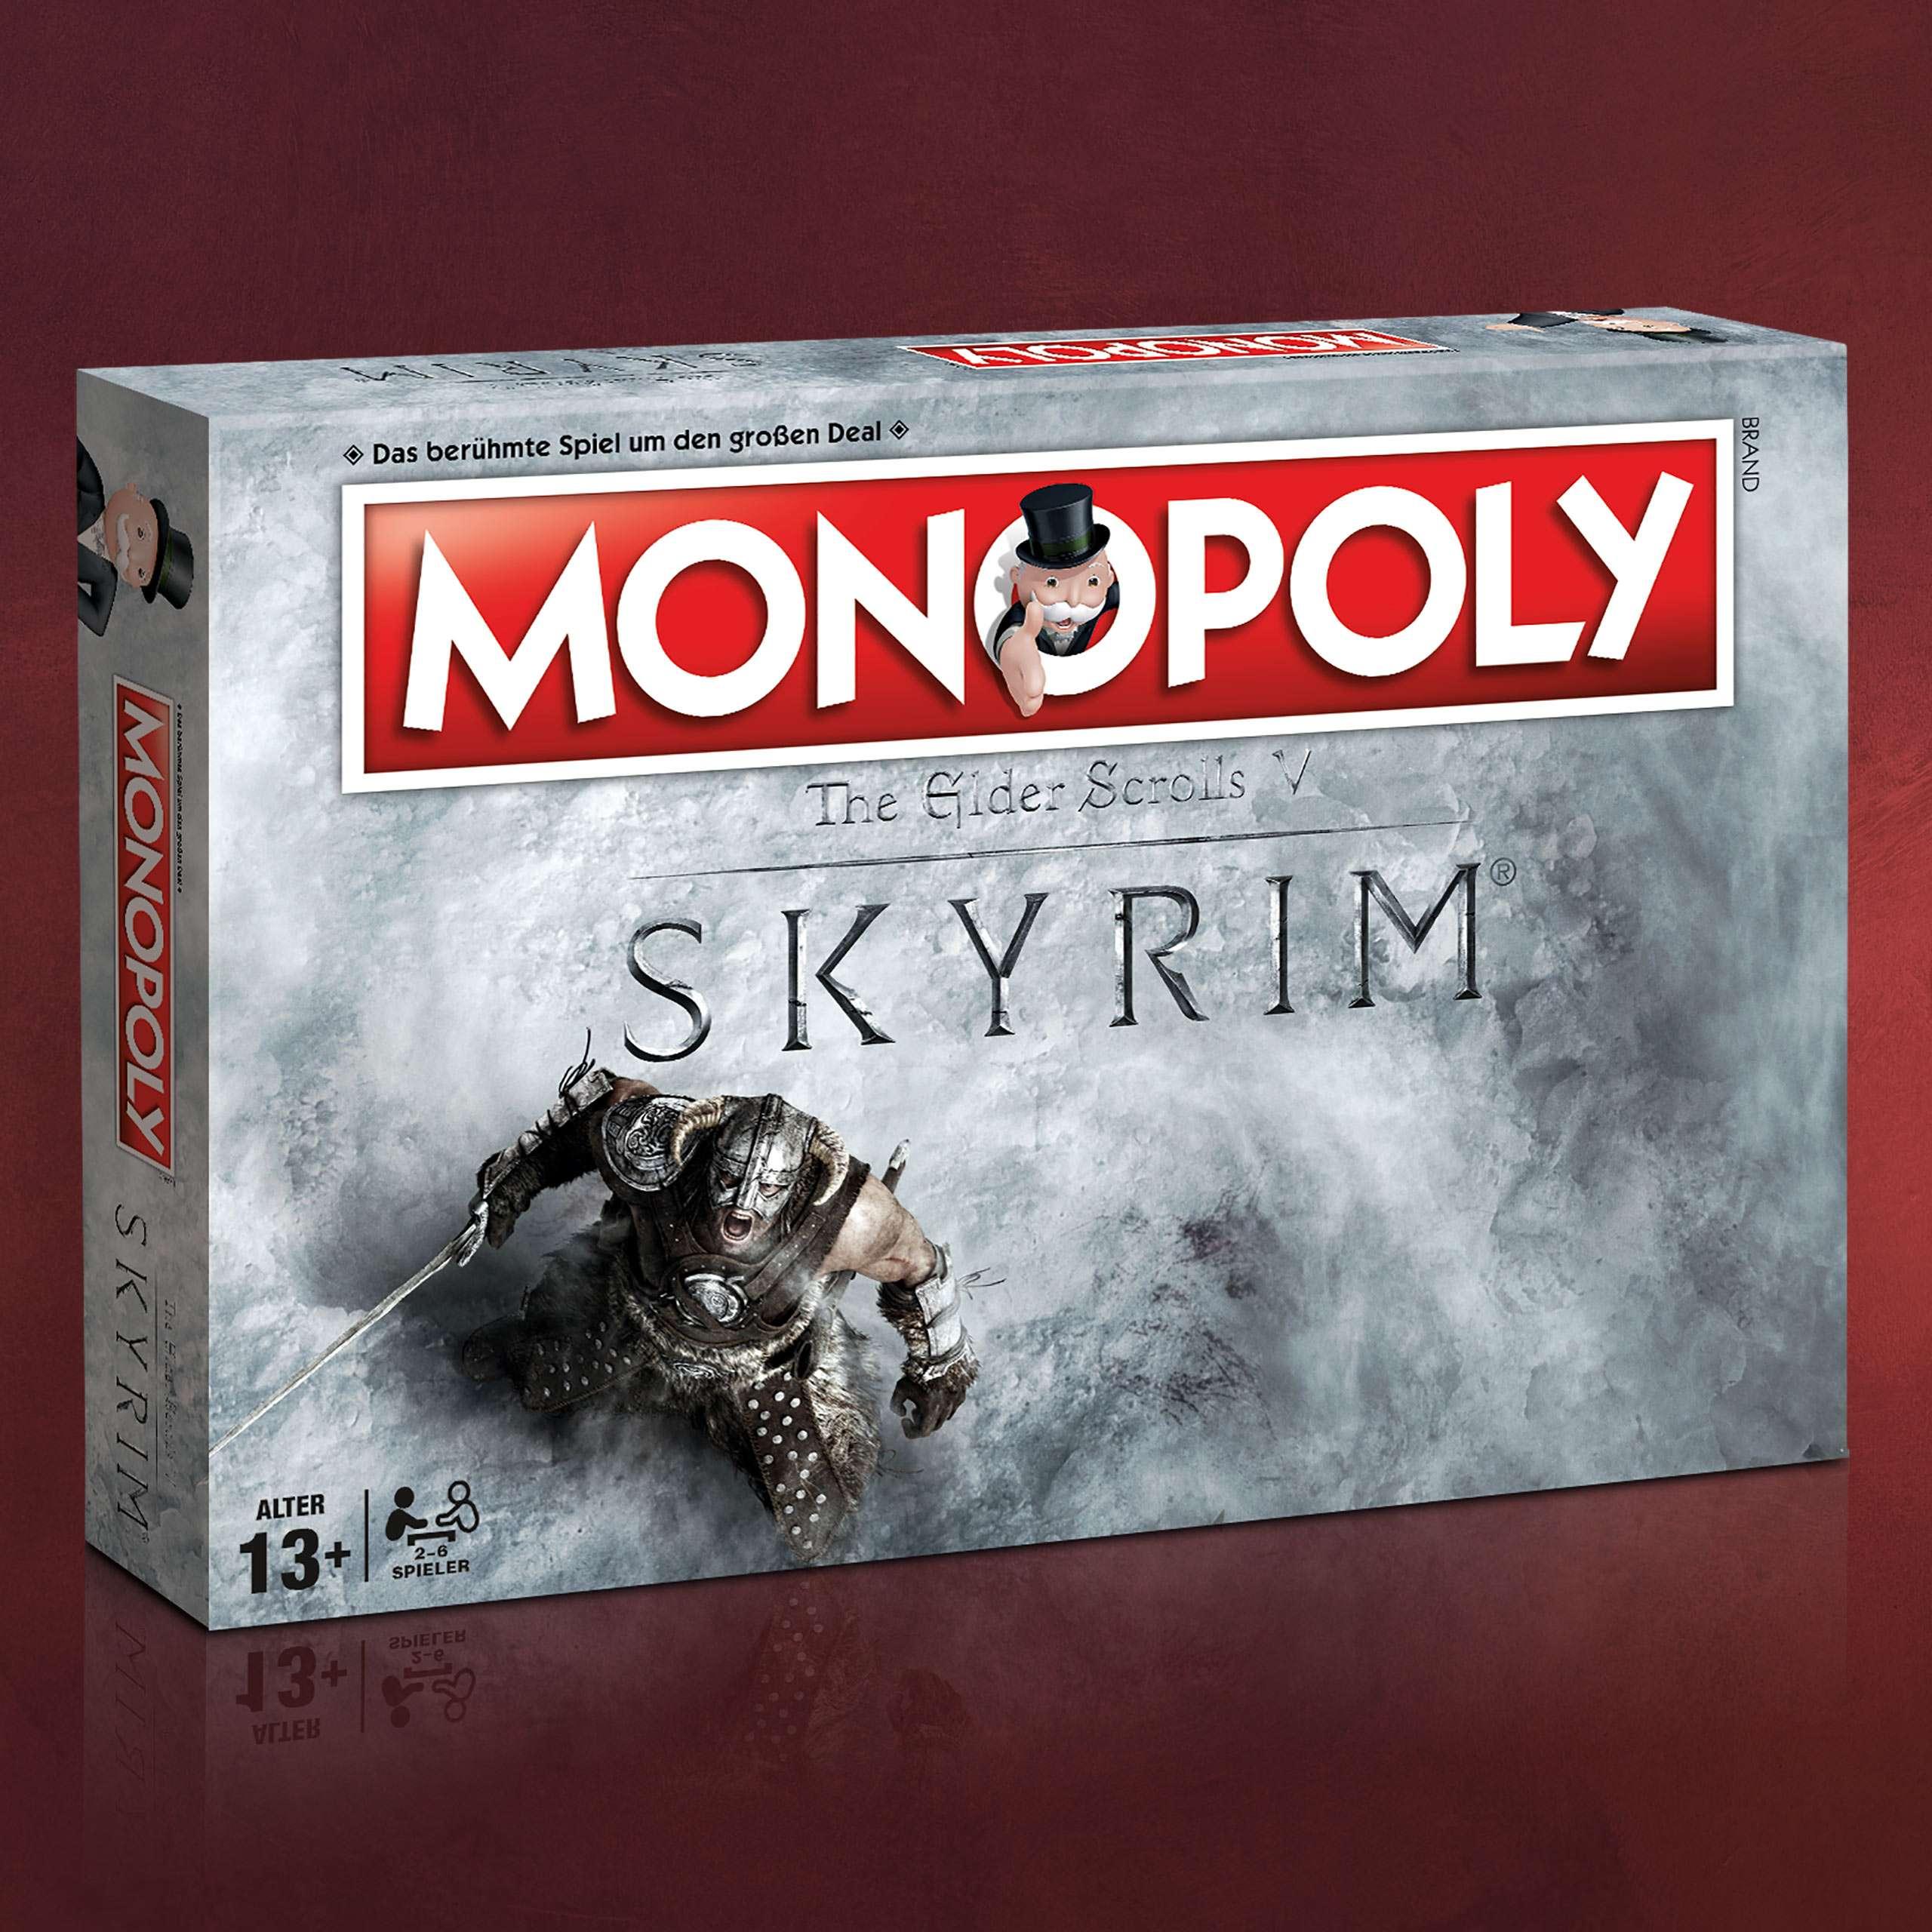 Skyrim - Monopoly | The Elder Scrolls | Elbenwald